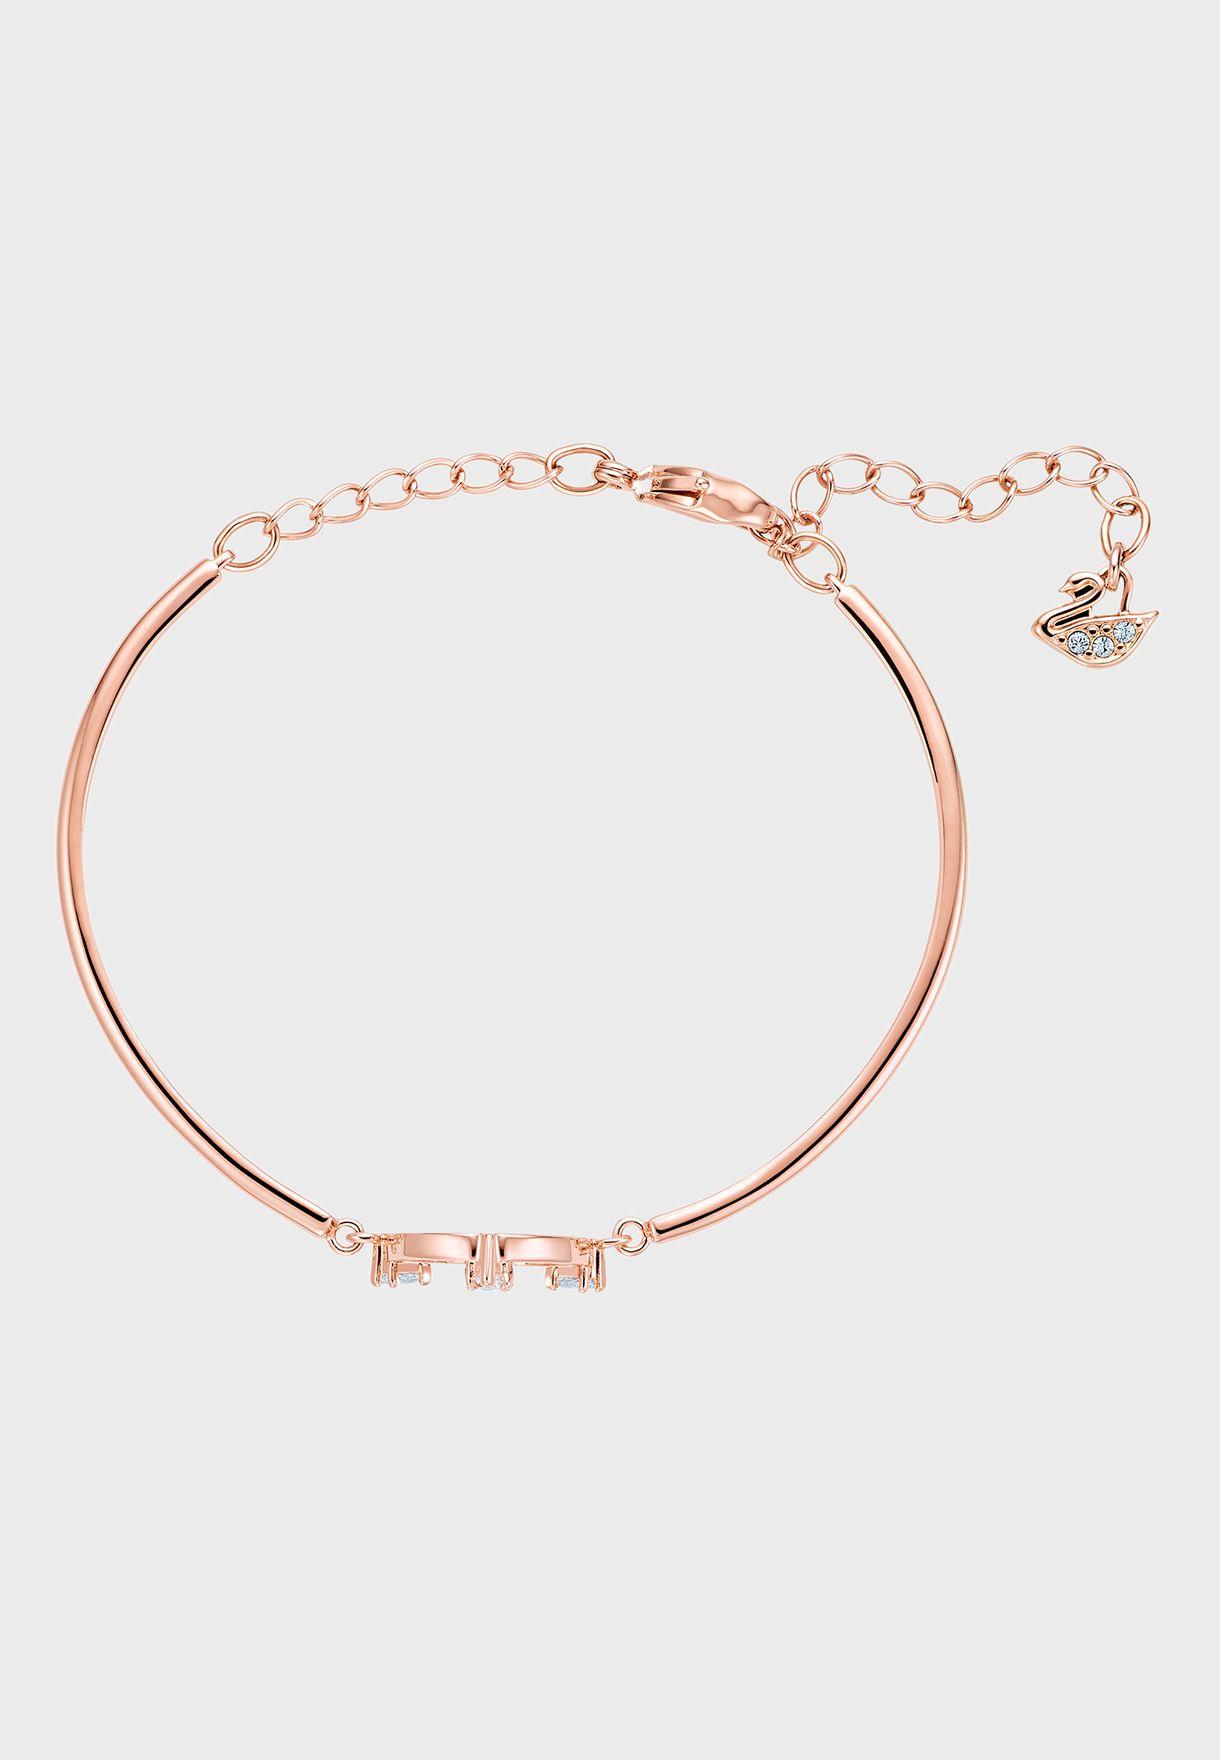 North Bangle Glass Bracelet